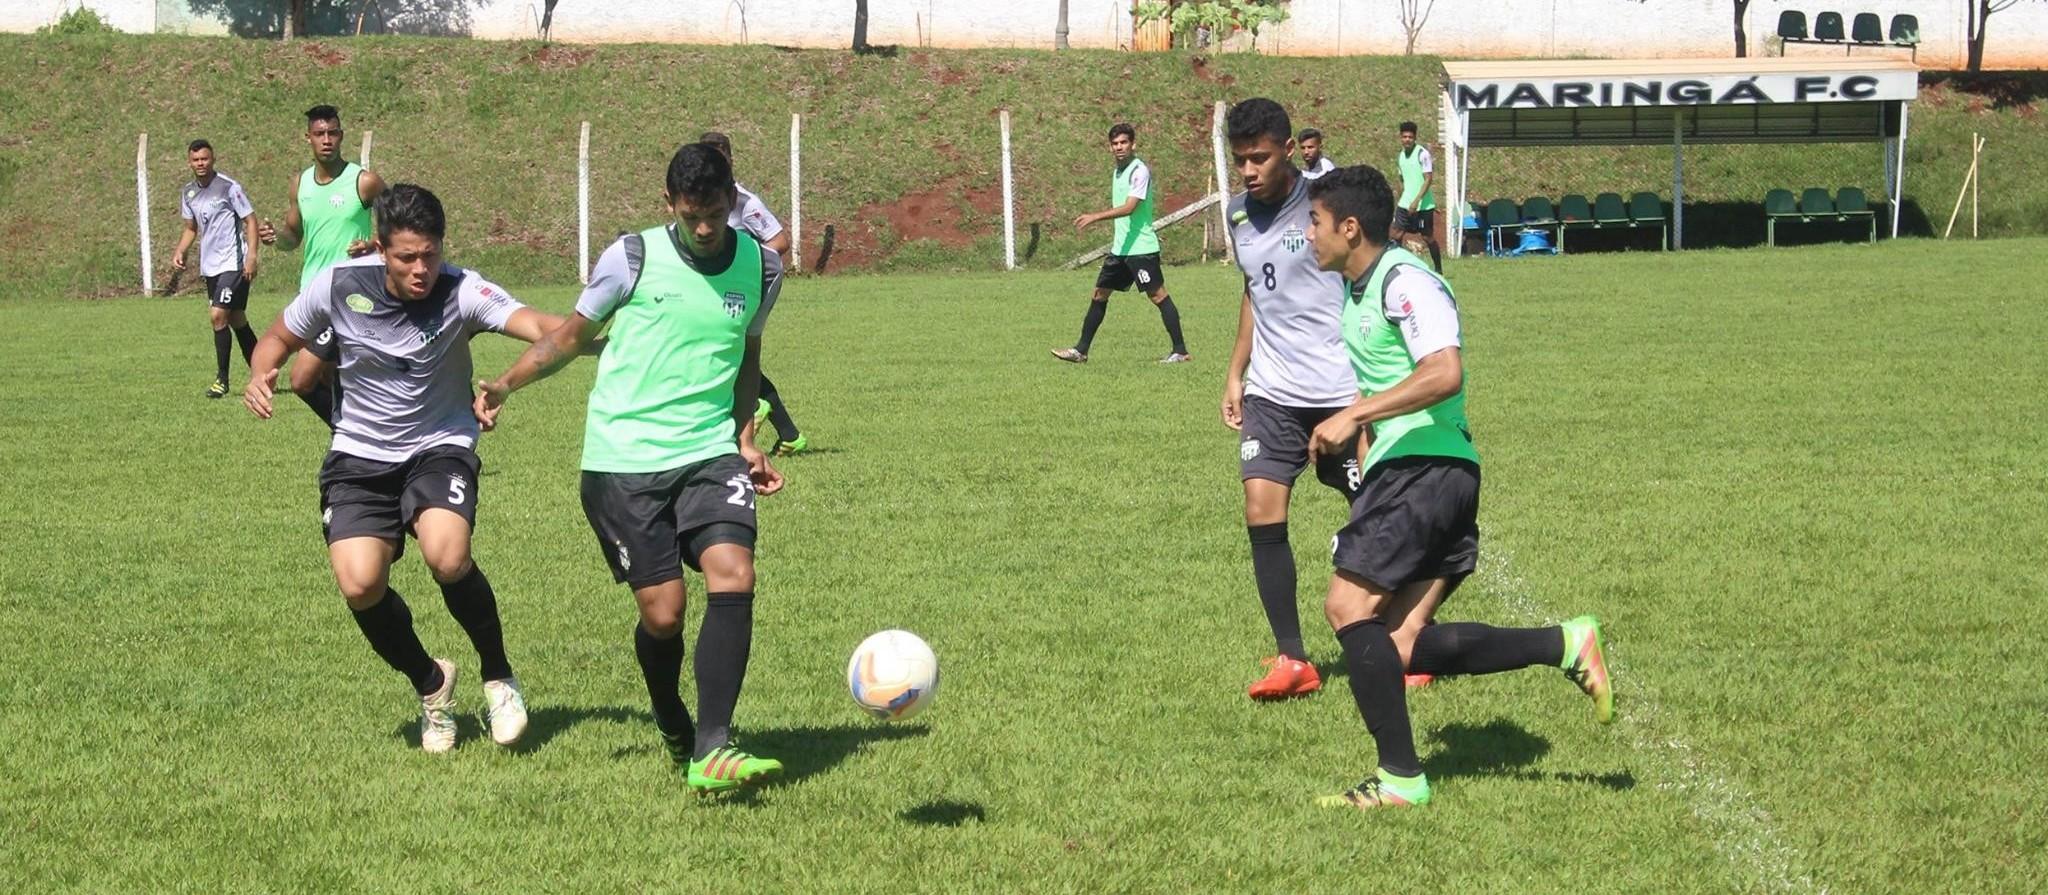 Maringá FC faz amistoso de olho no Paranaense 2018